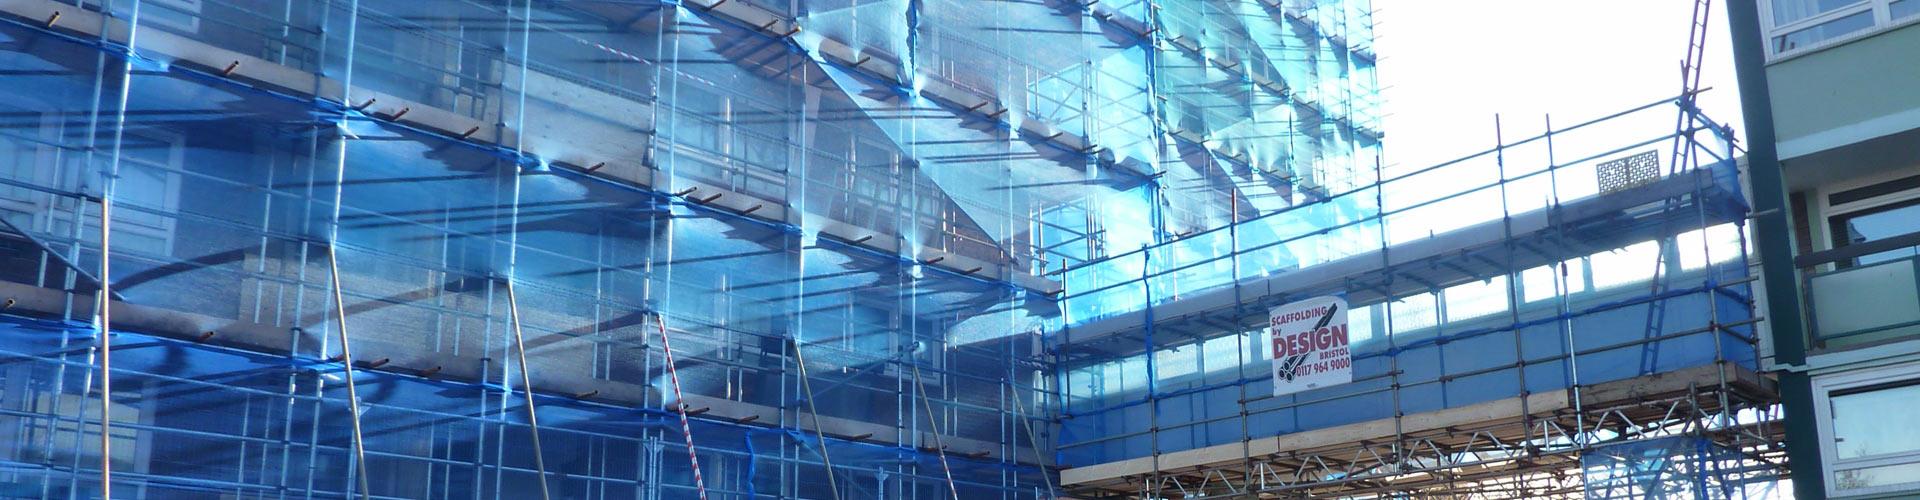 debris netting for scaffolding